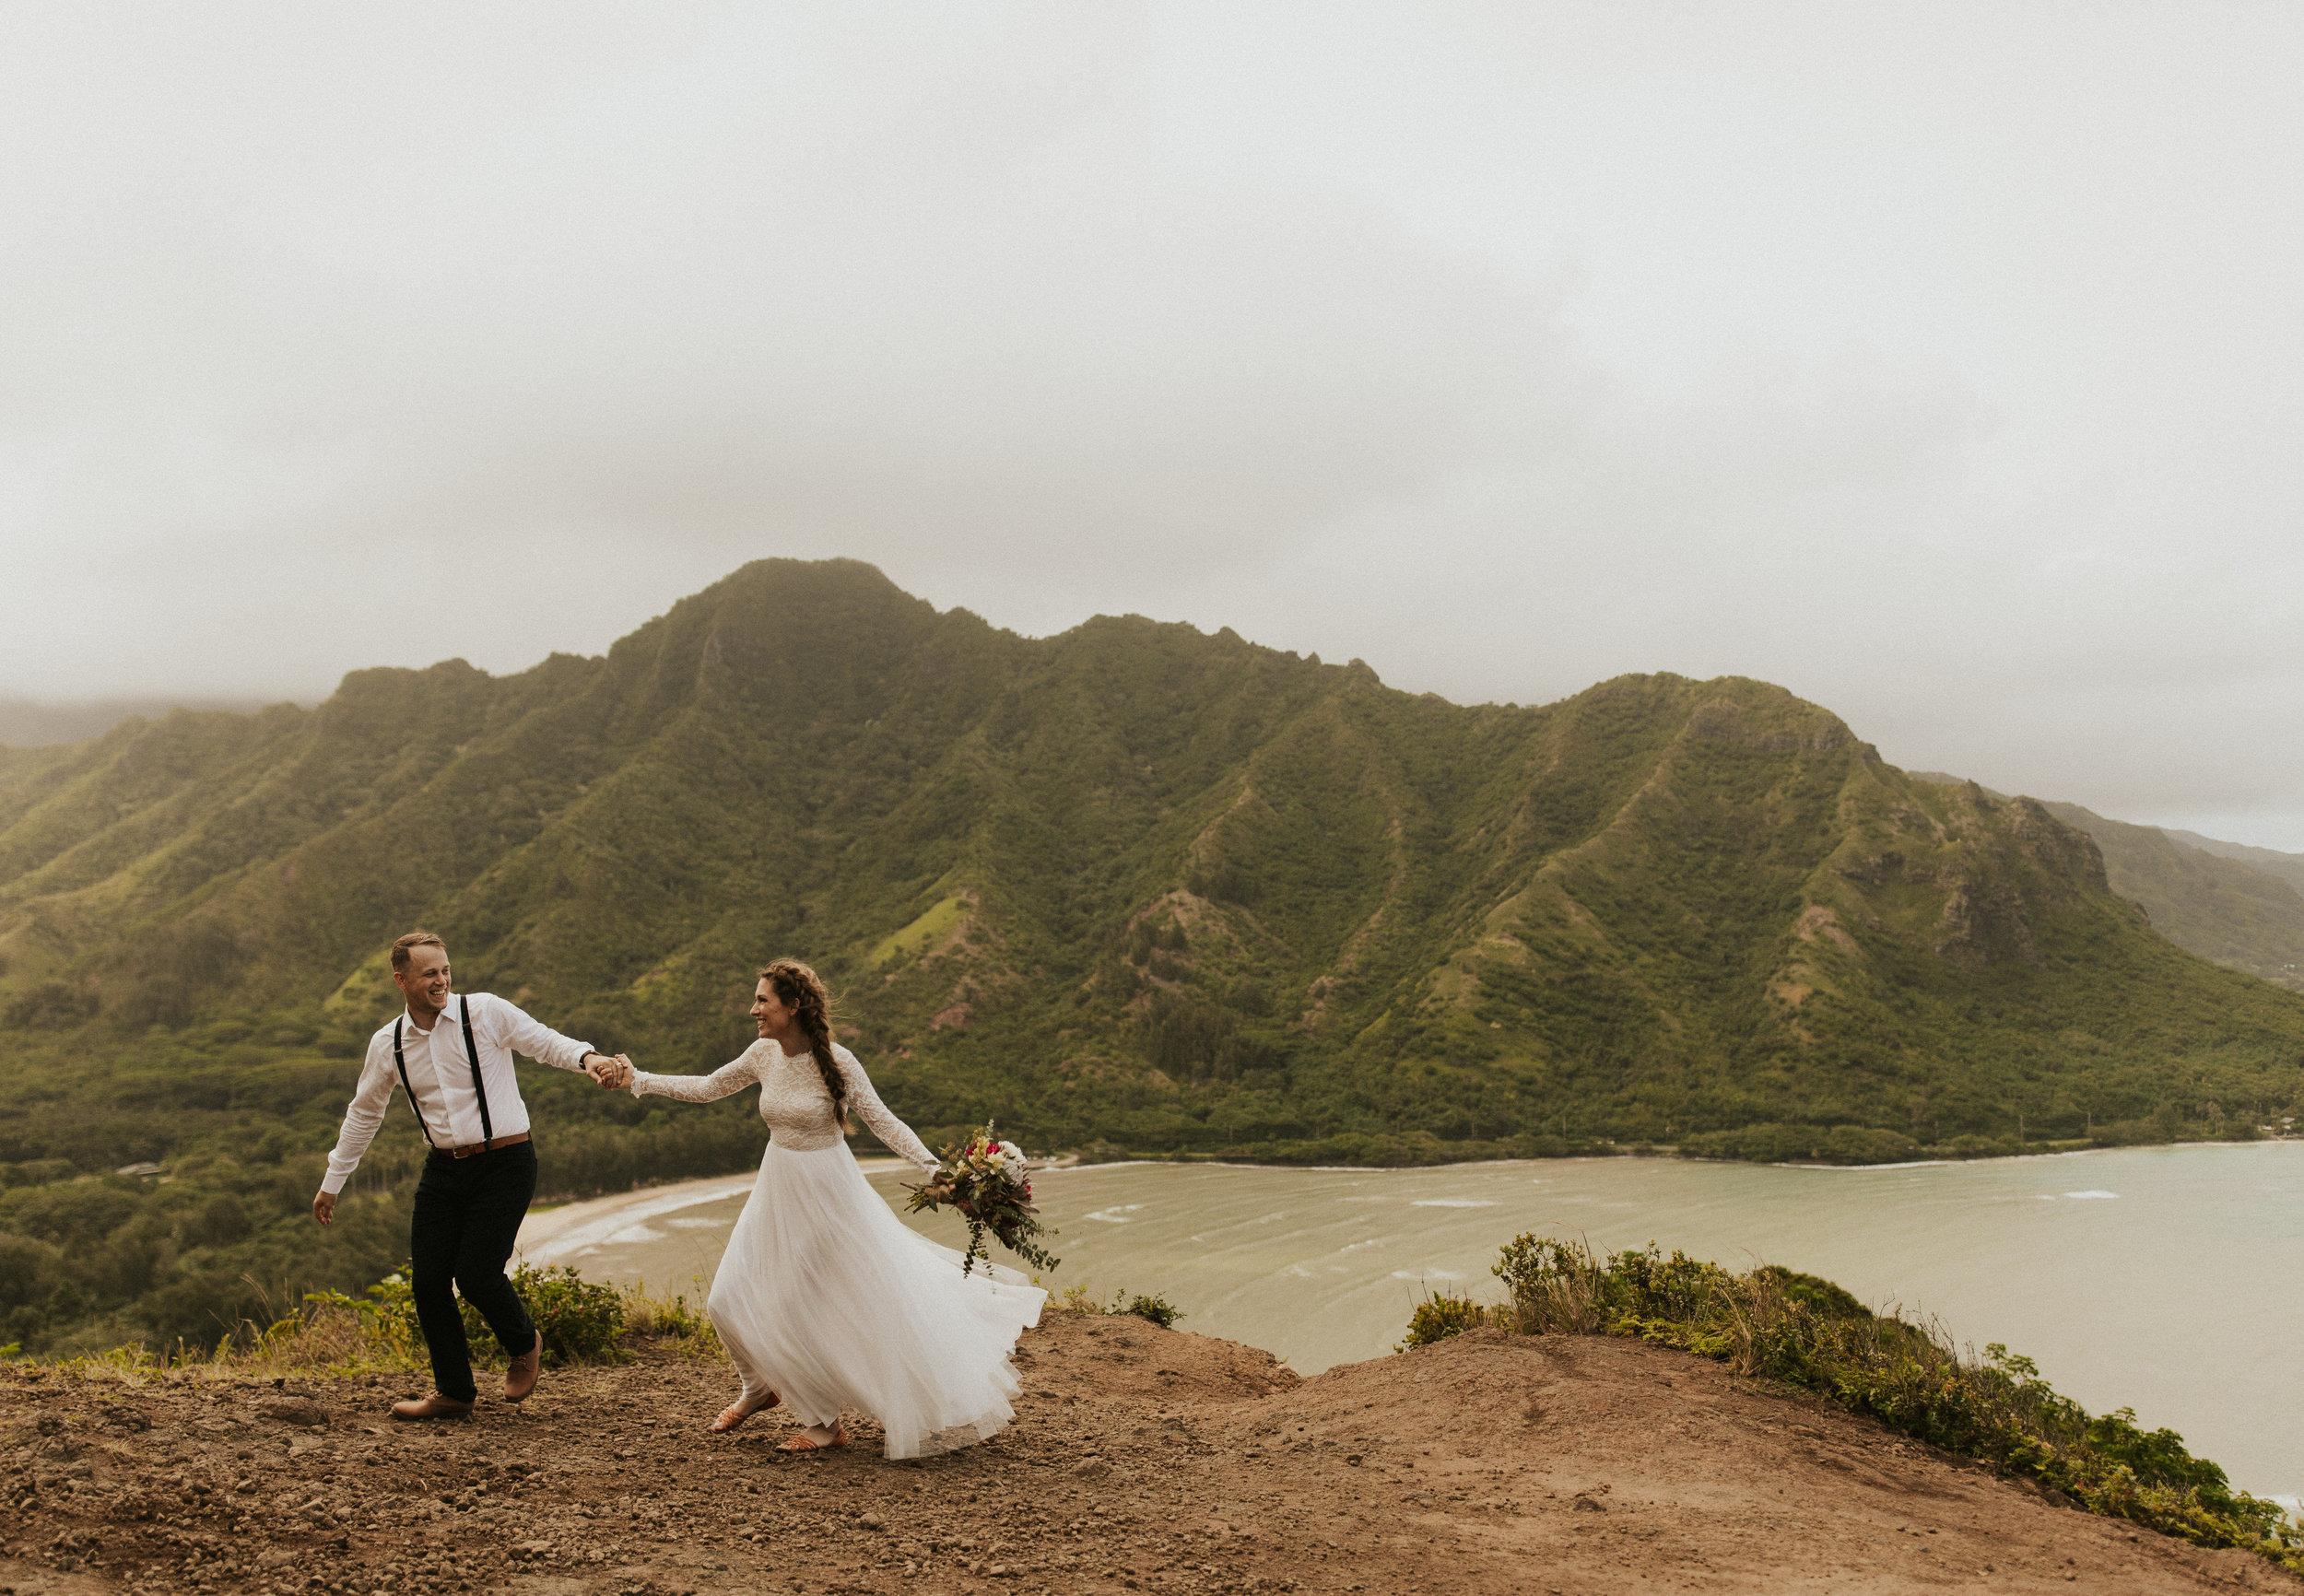 the-mclachlans-destination-elopement-photographers-mountain-hike-sena-eric-34.jpg